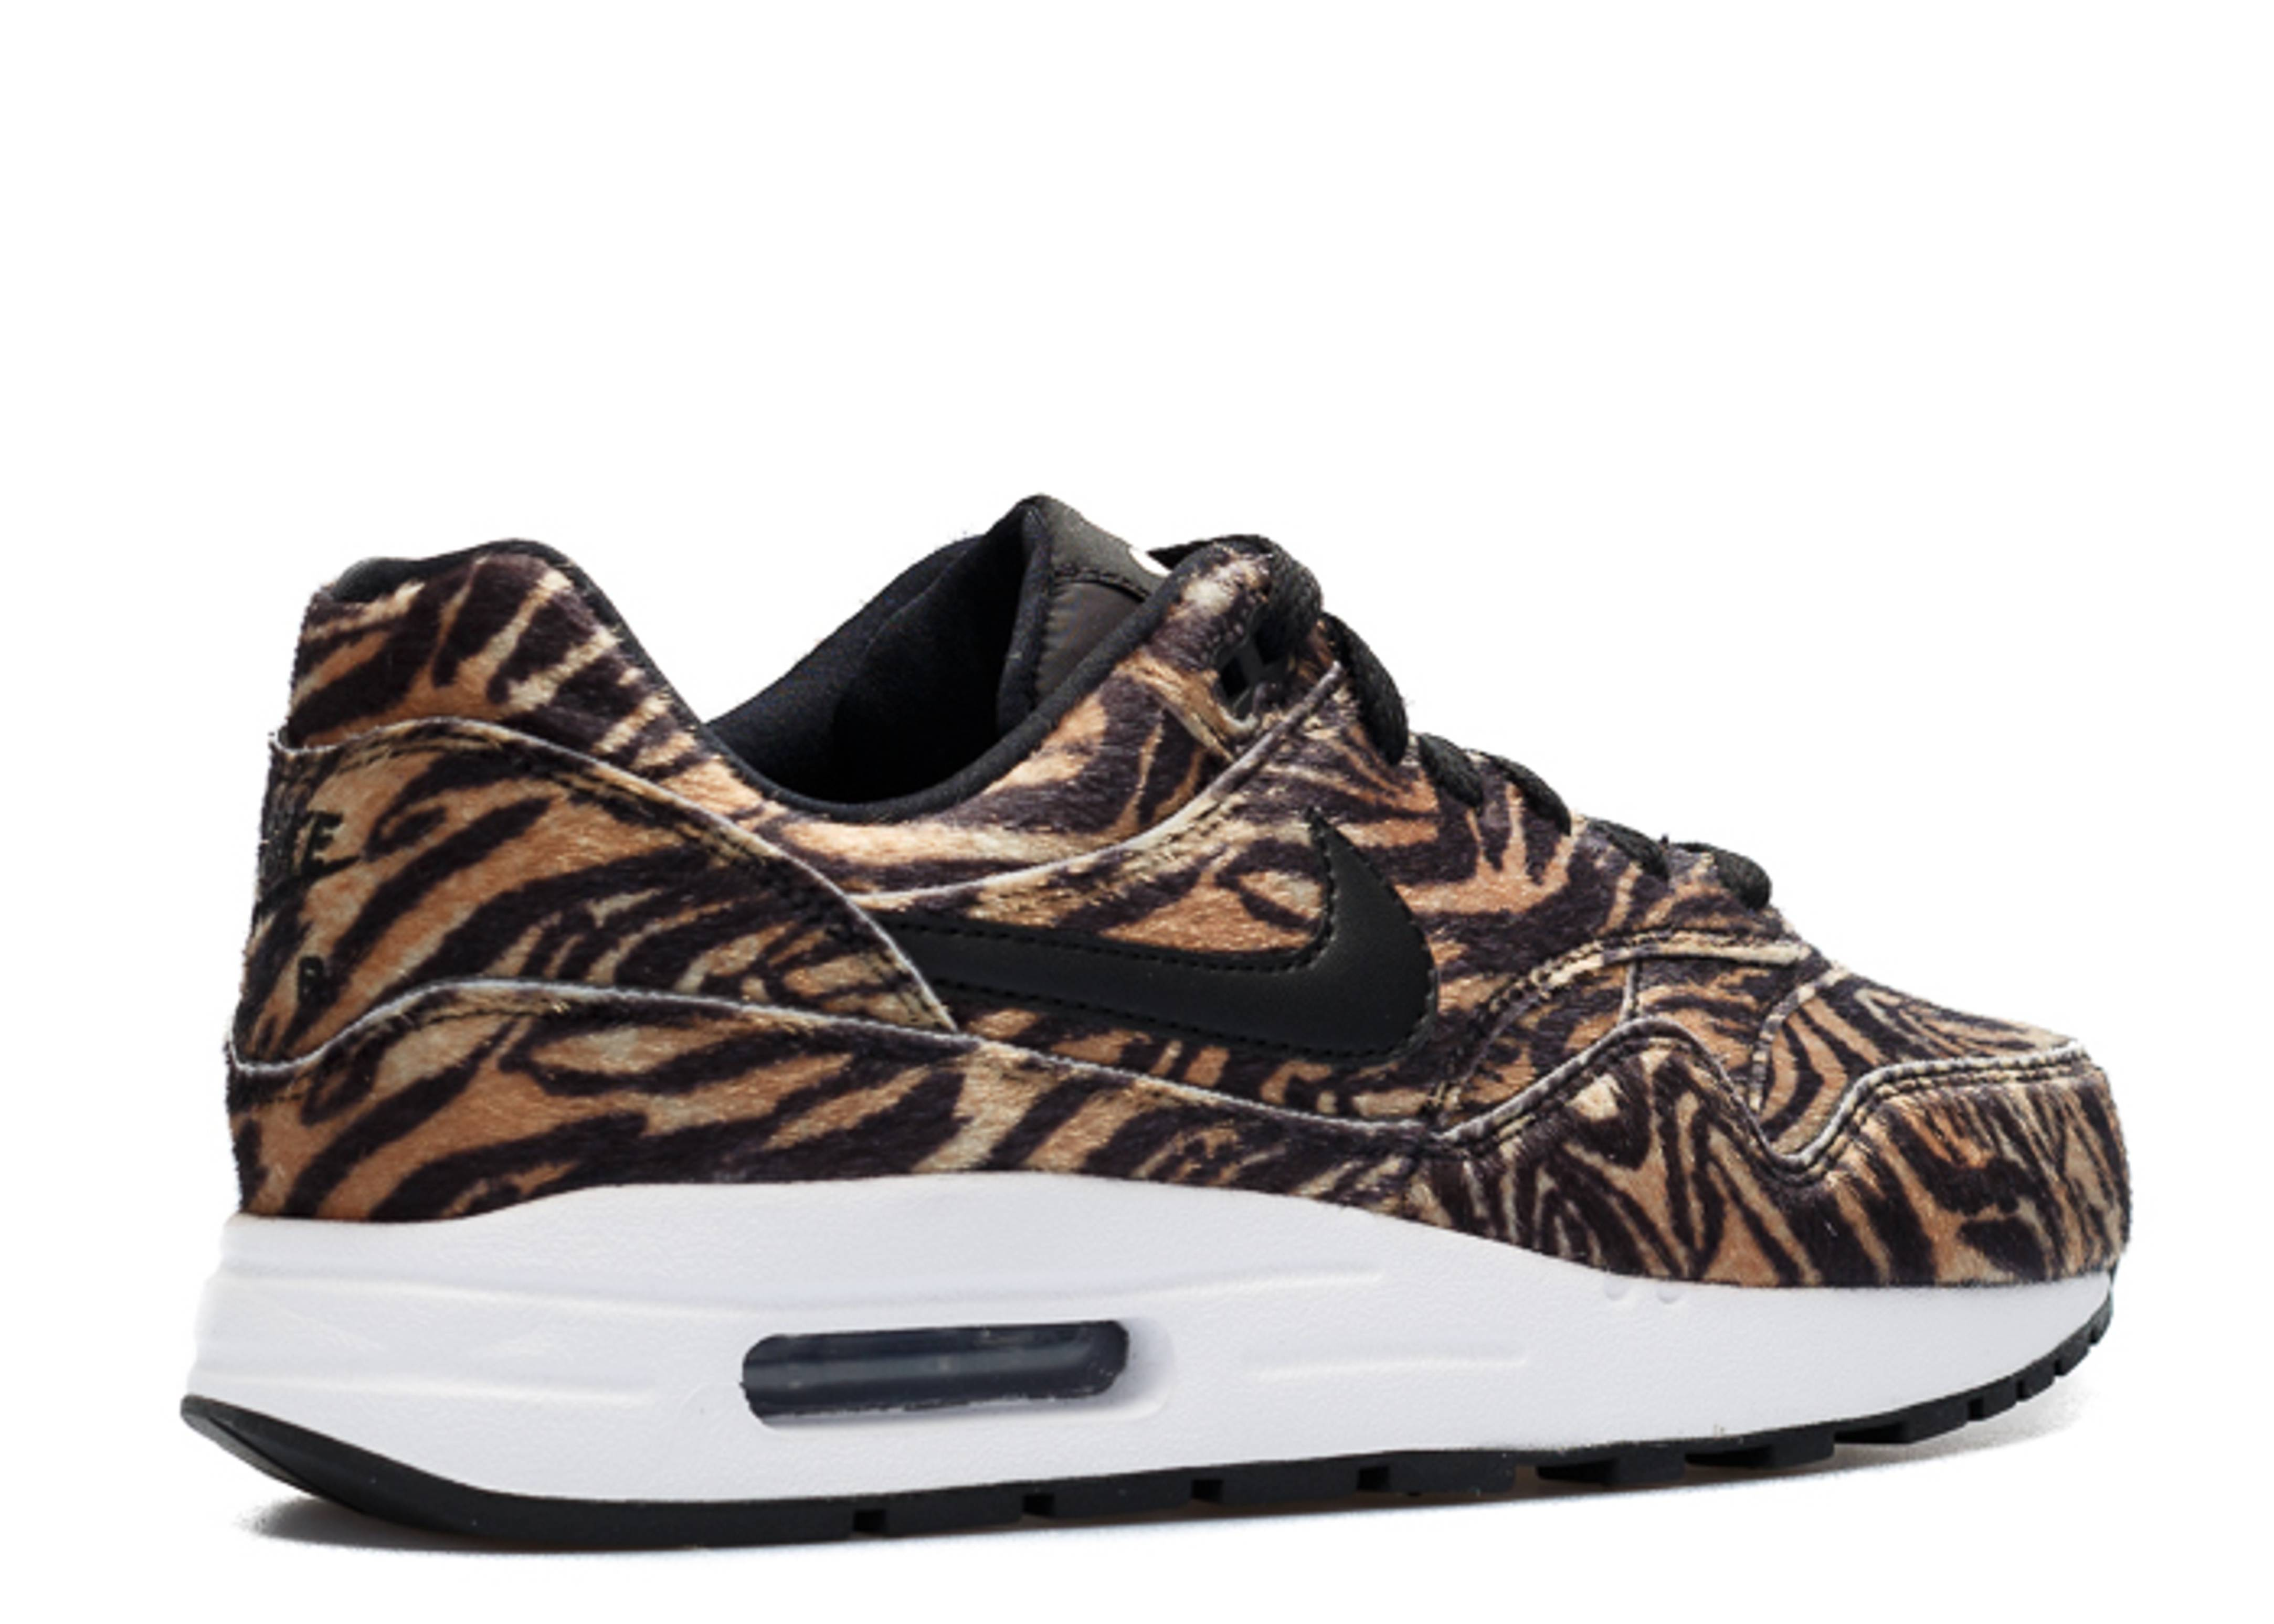 0deab0ed79ad Nike Air Max 1 Black Tiger